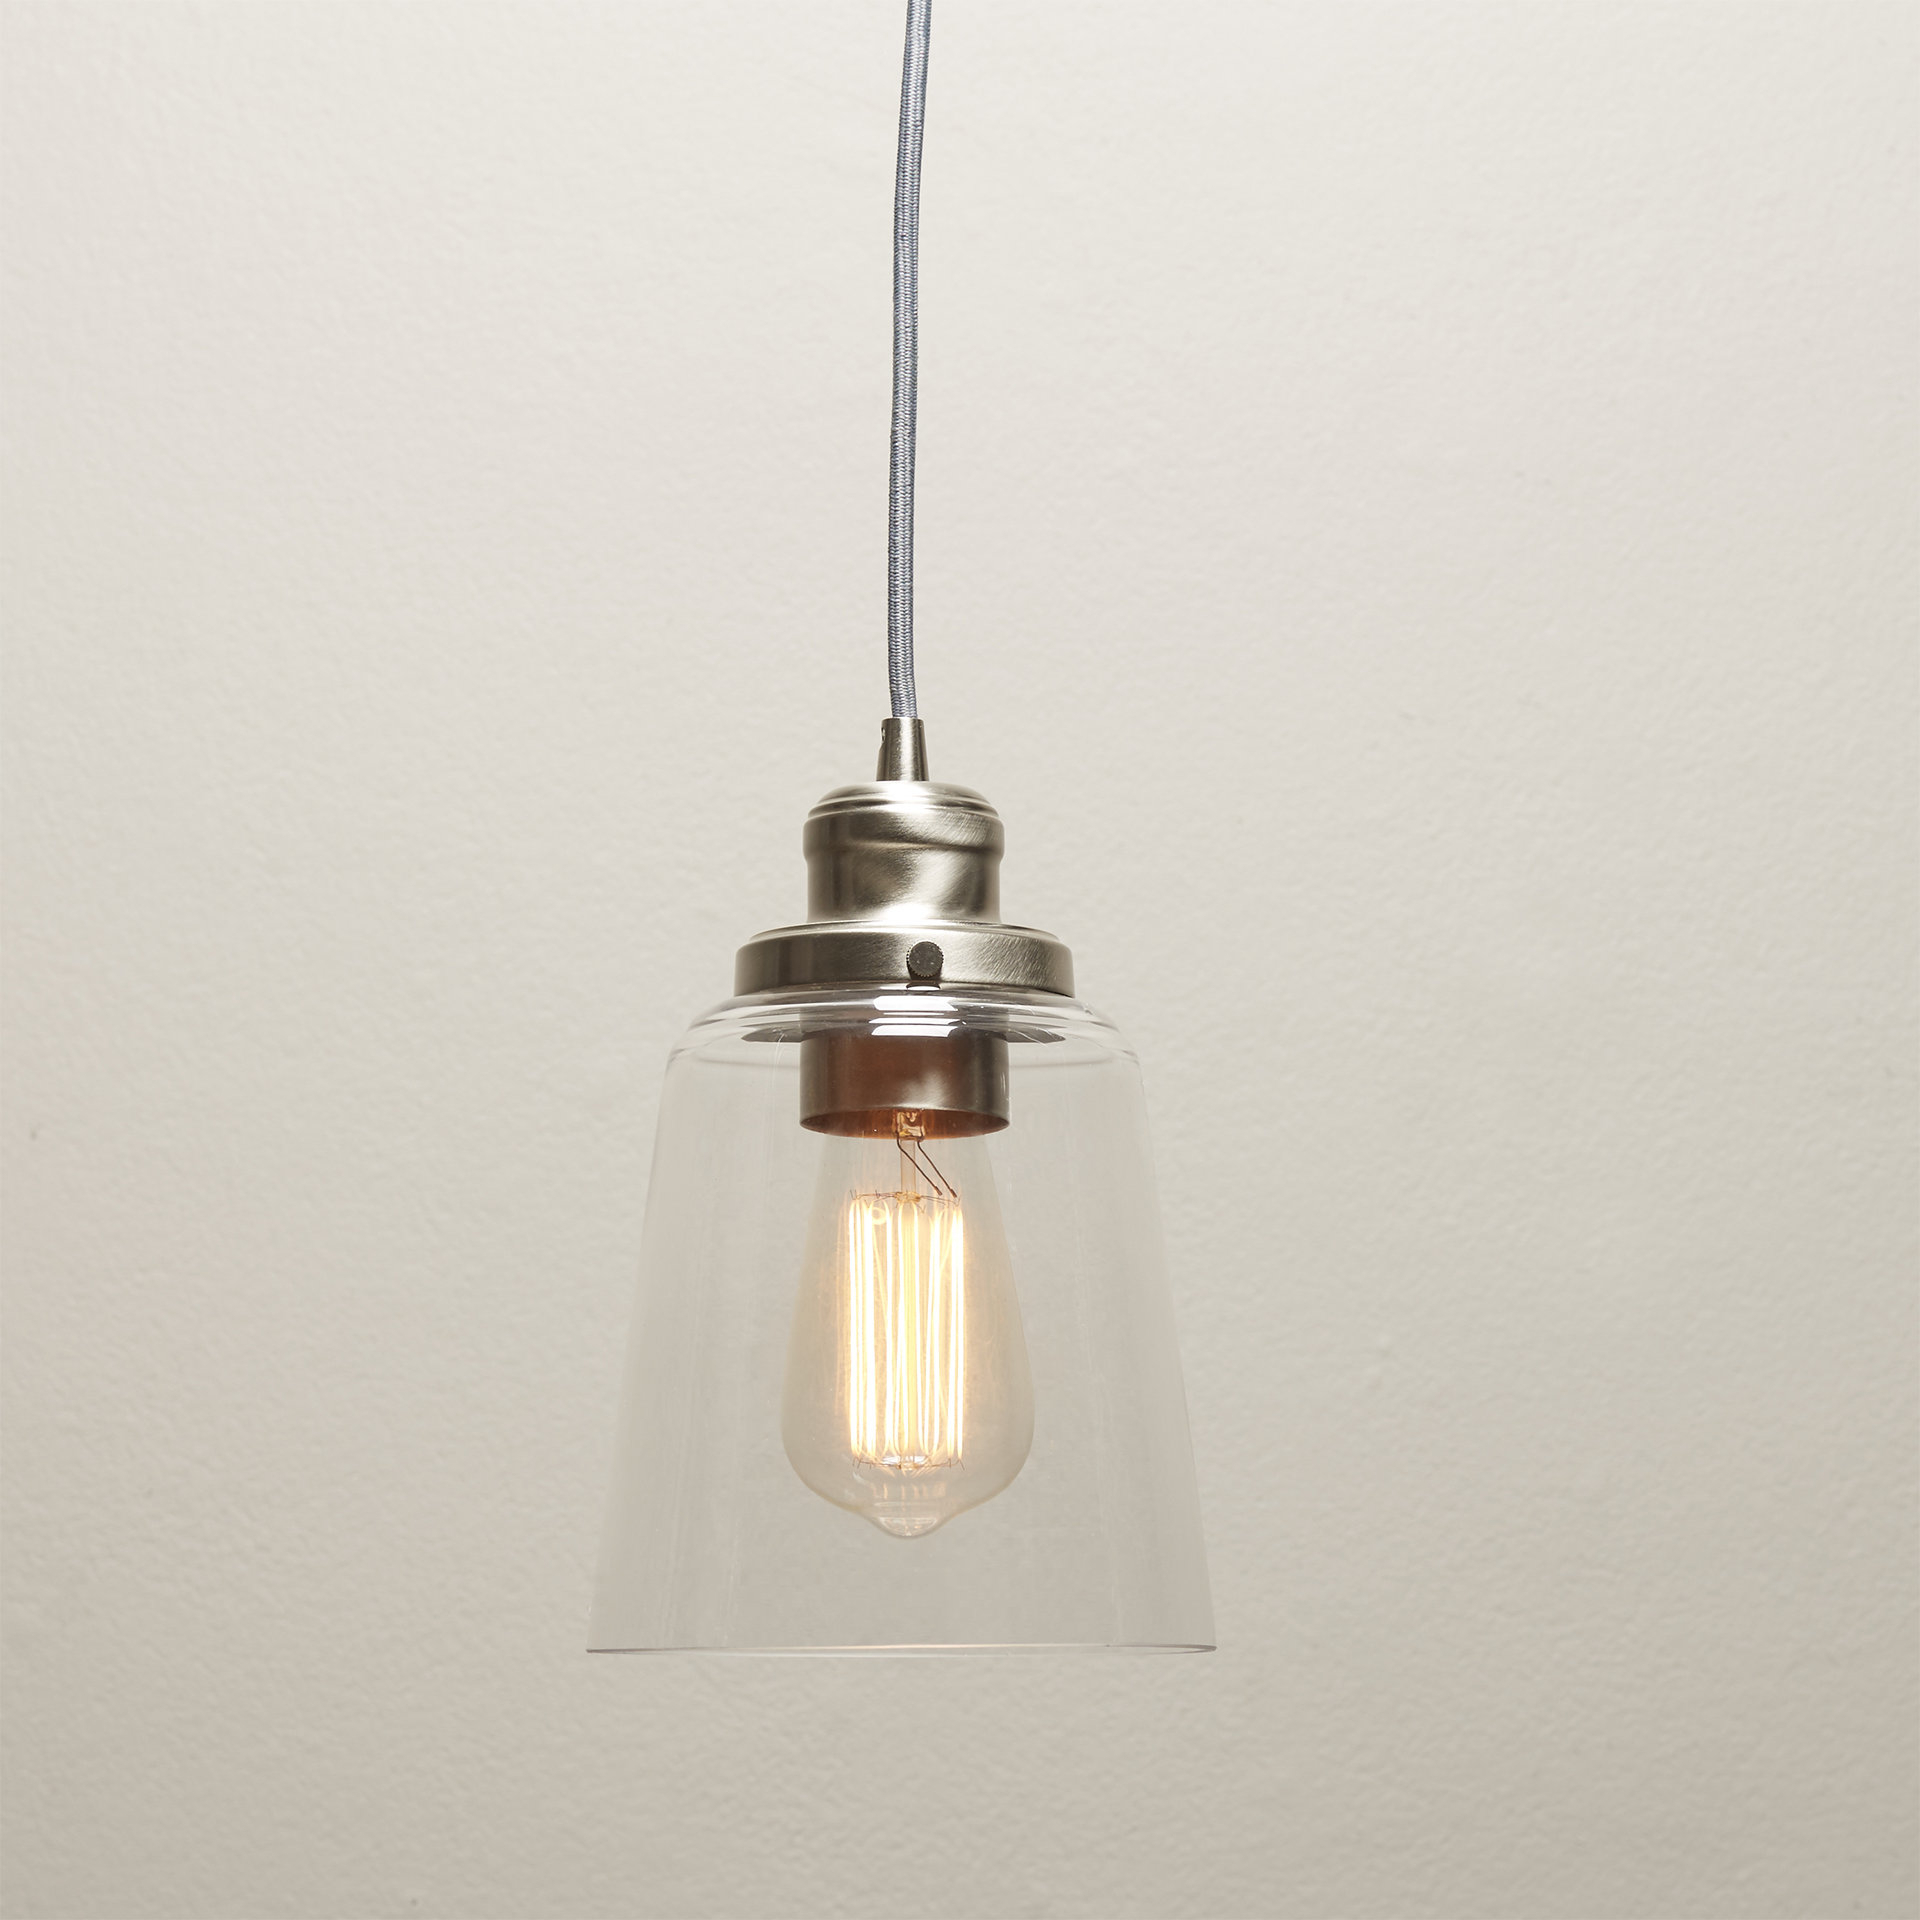 2020 1 Light Single Bell Pendant In Sargent 1 Light Single Bell Pendants (Gallery 5 of 20)